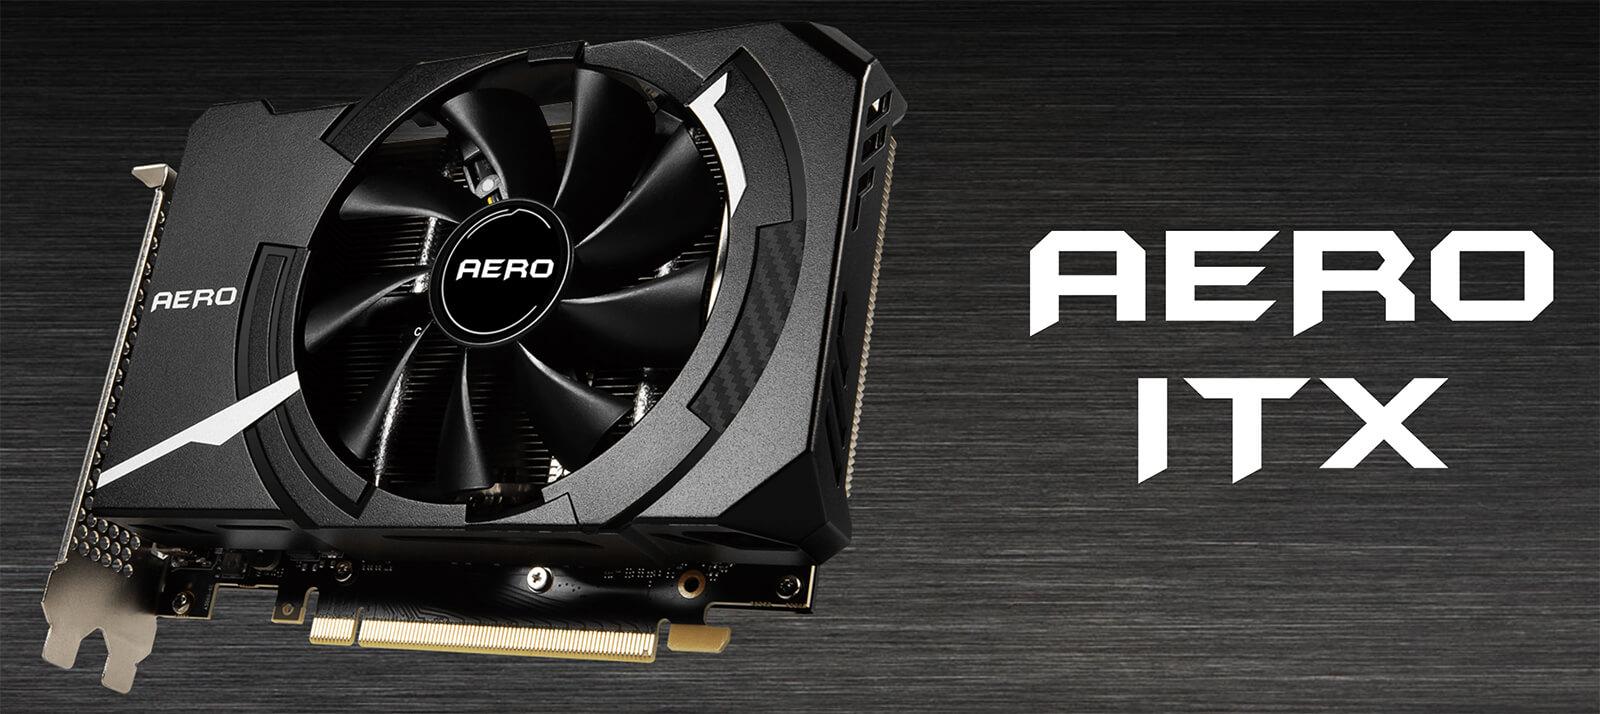 Msi Geforce Rtx™ 3060 Aero Itx 12g Features